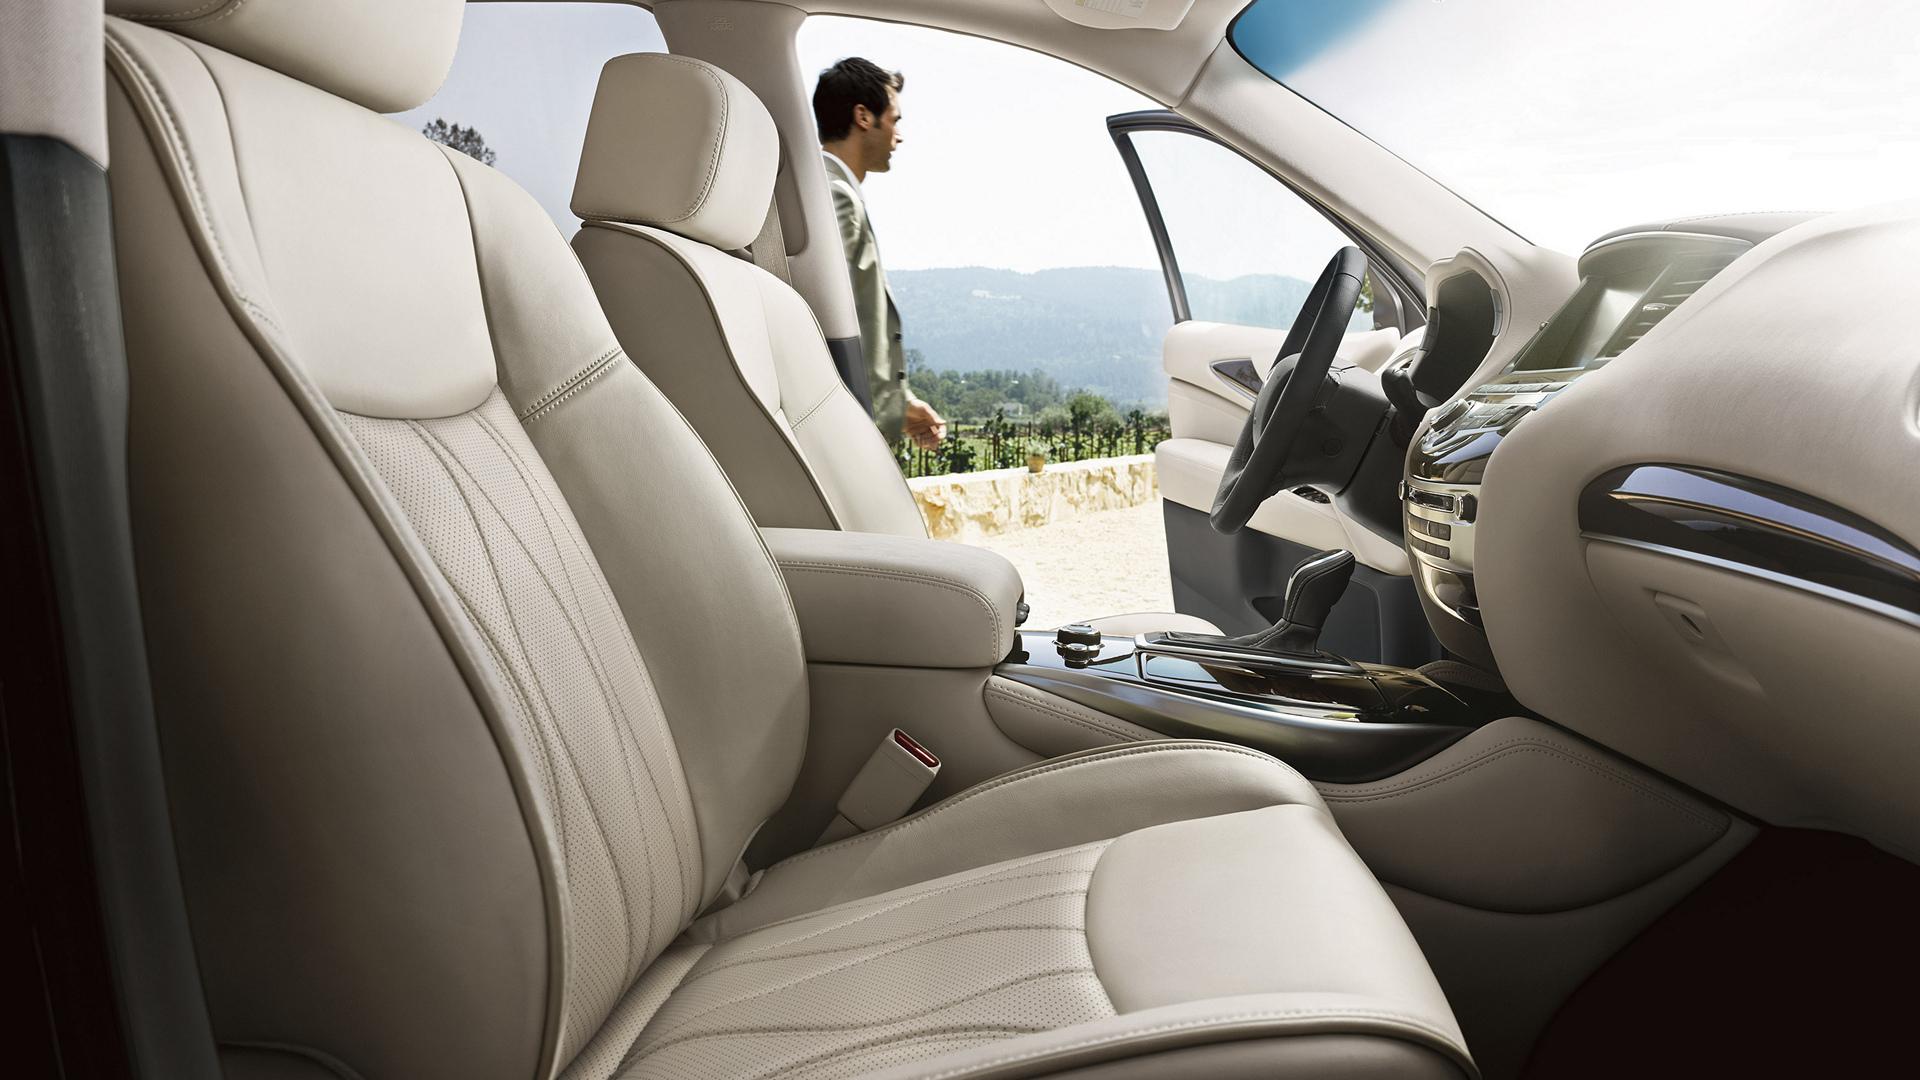 2016 Infiniti QX60 Hybrid © Nissan Motor Co., Ltd.